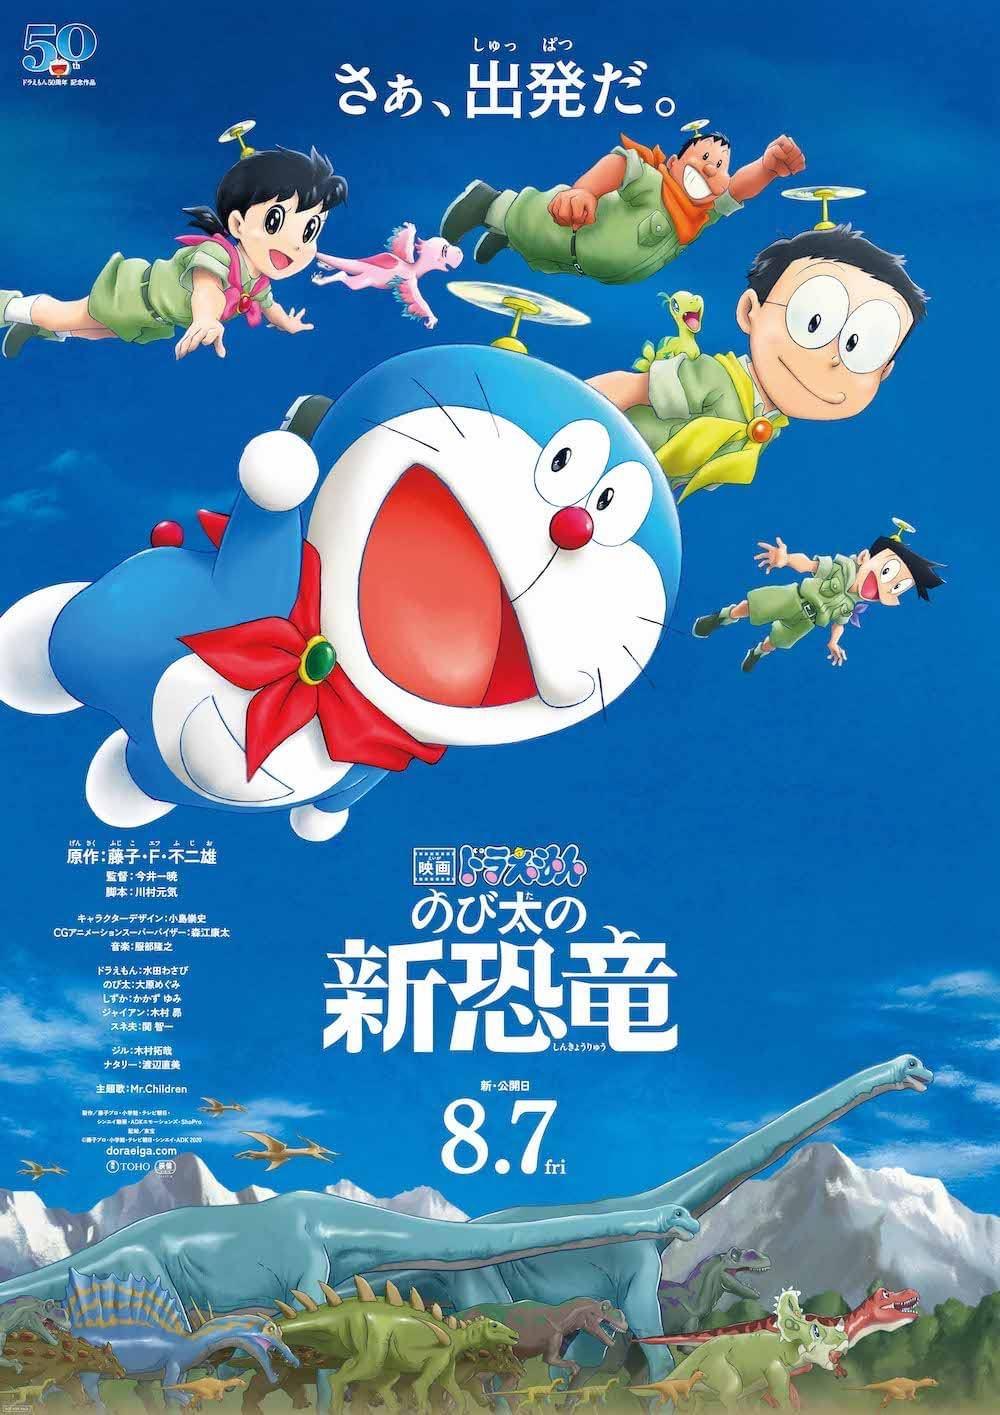 Gallery โดราเอมอน ไดโนเสาร์ตัวใหม่ของโนบิตะ   Doraemon Thai Wiki   Fandom is free HD wallpaper.